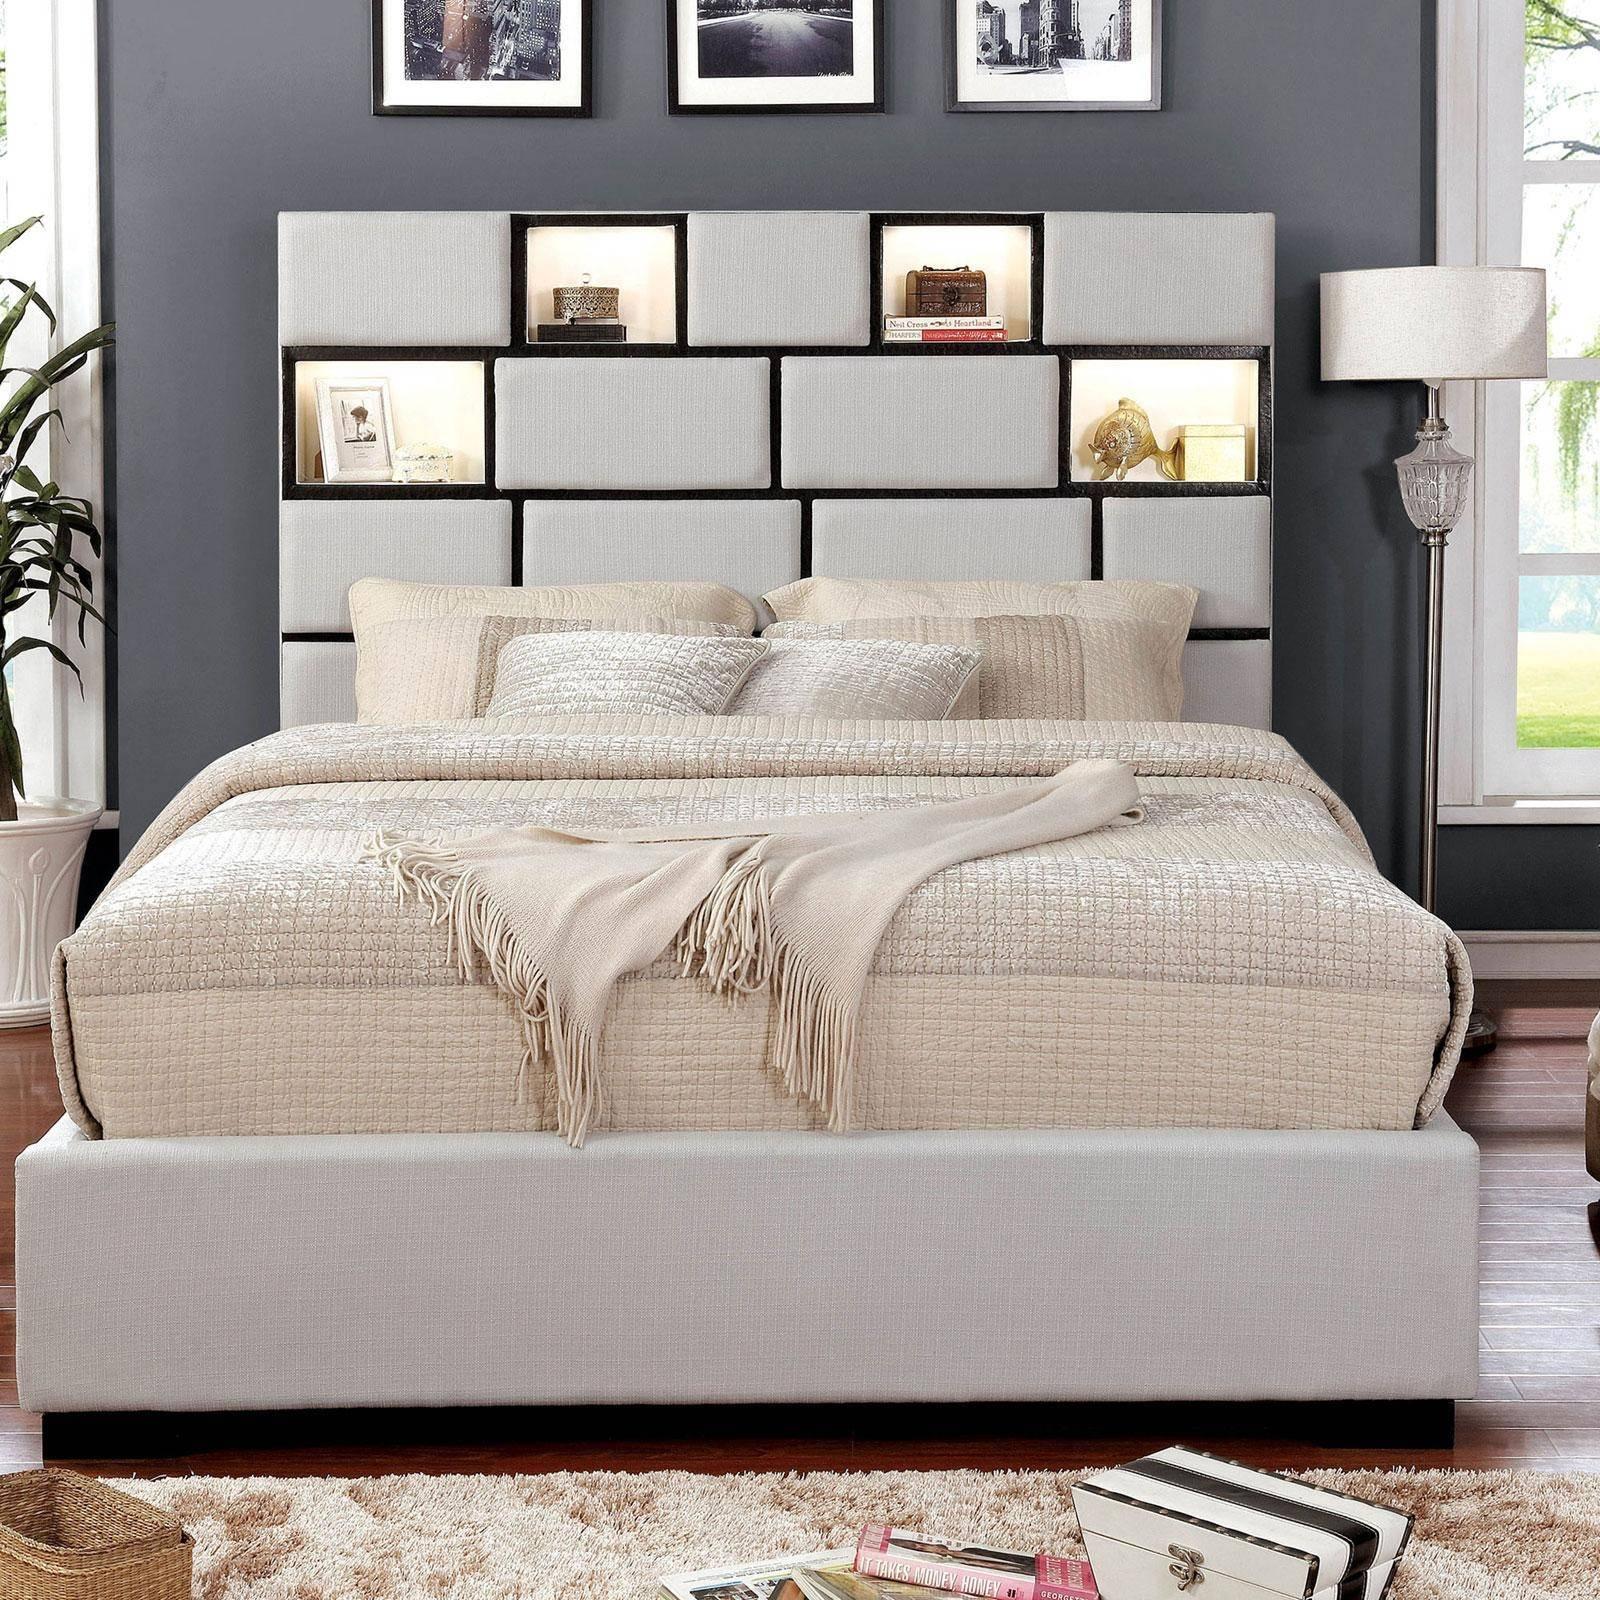 furniture of america gemma california king platform bed in beige fabric